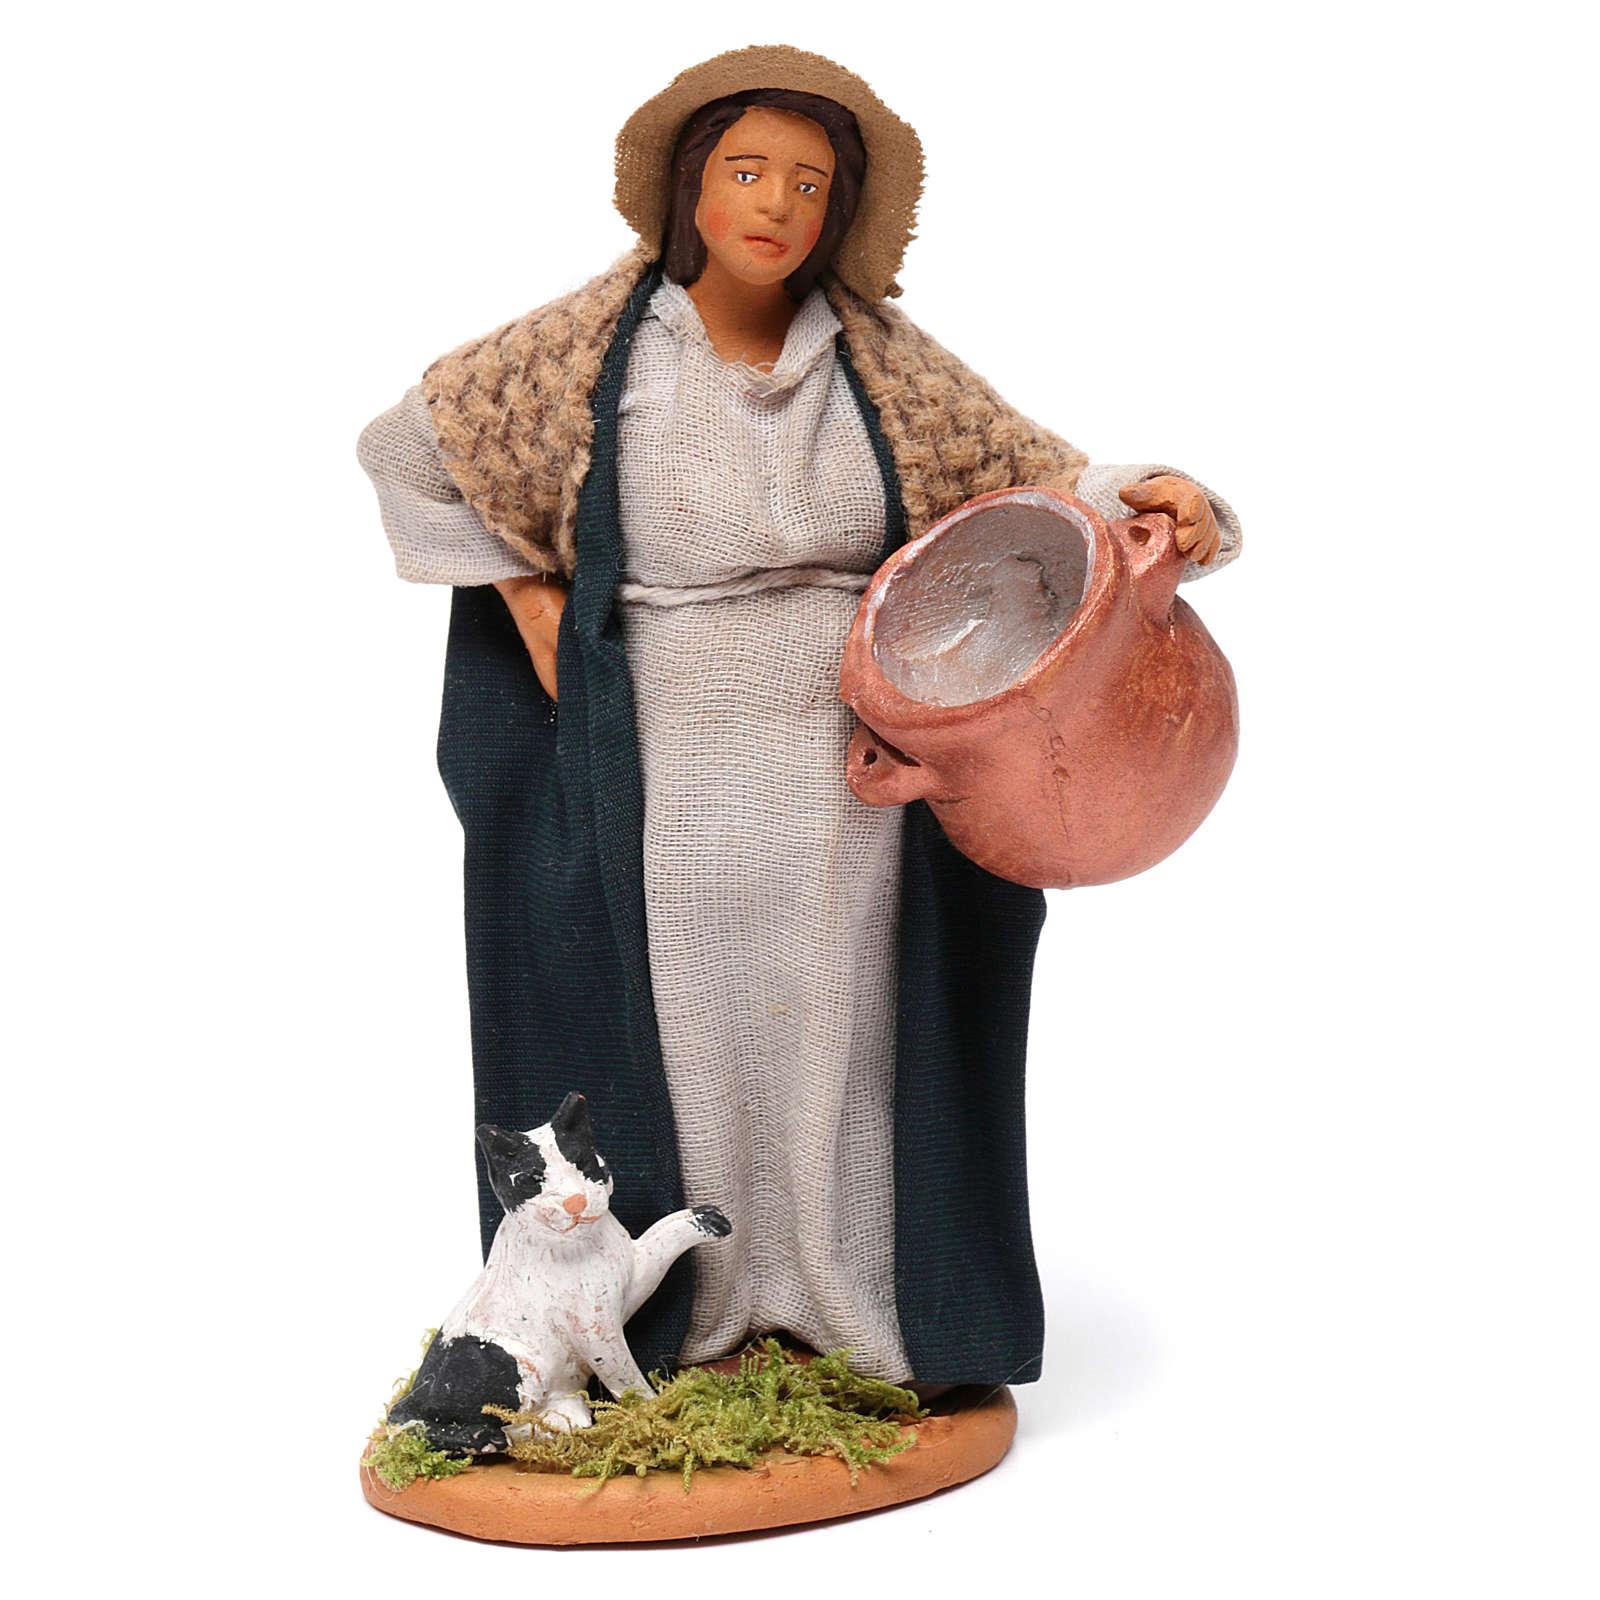 Pregnant shepherdess with pot and kitten for Neapolitan Nativity scene 12 cm 4